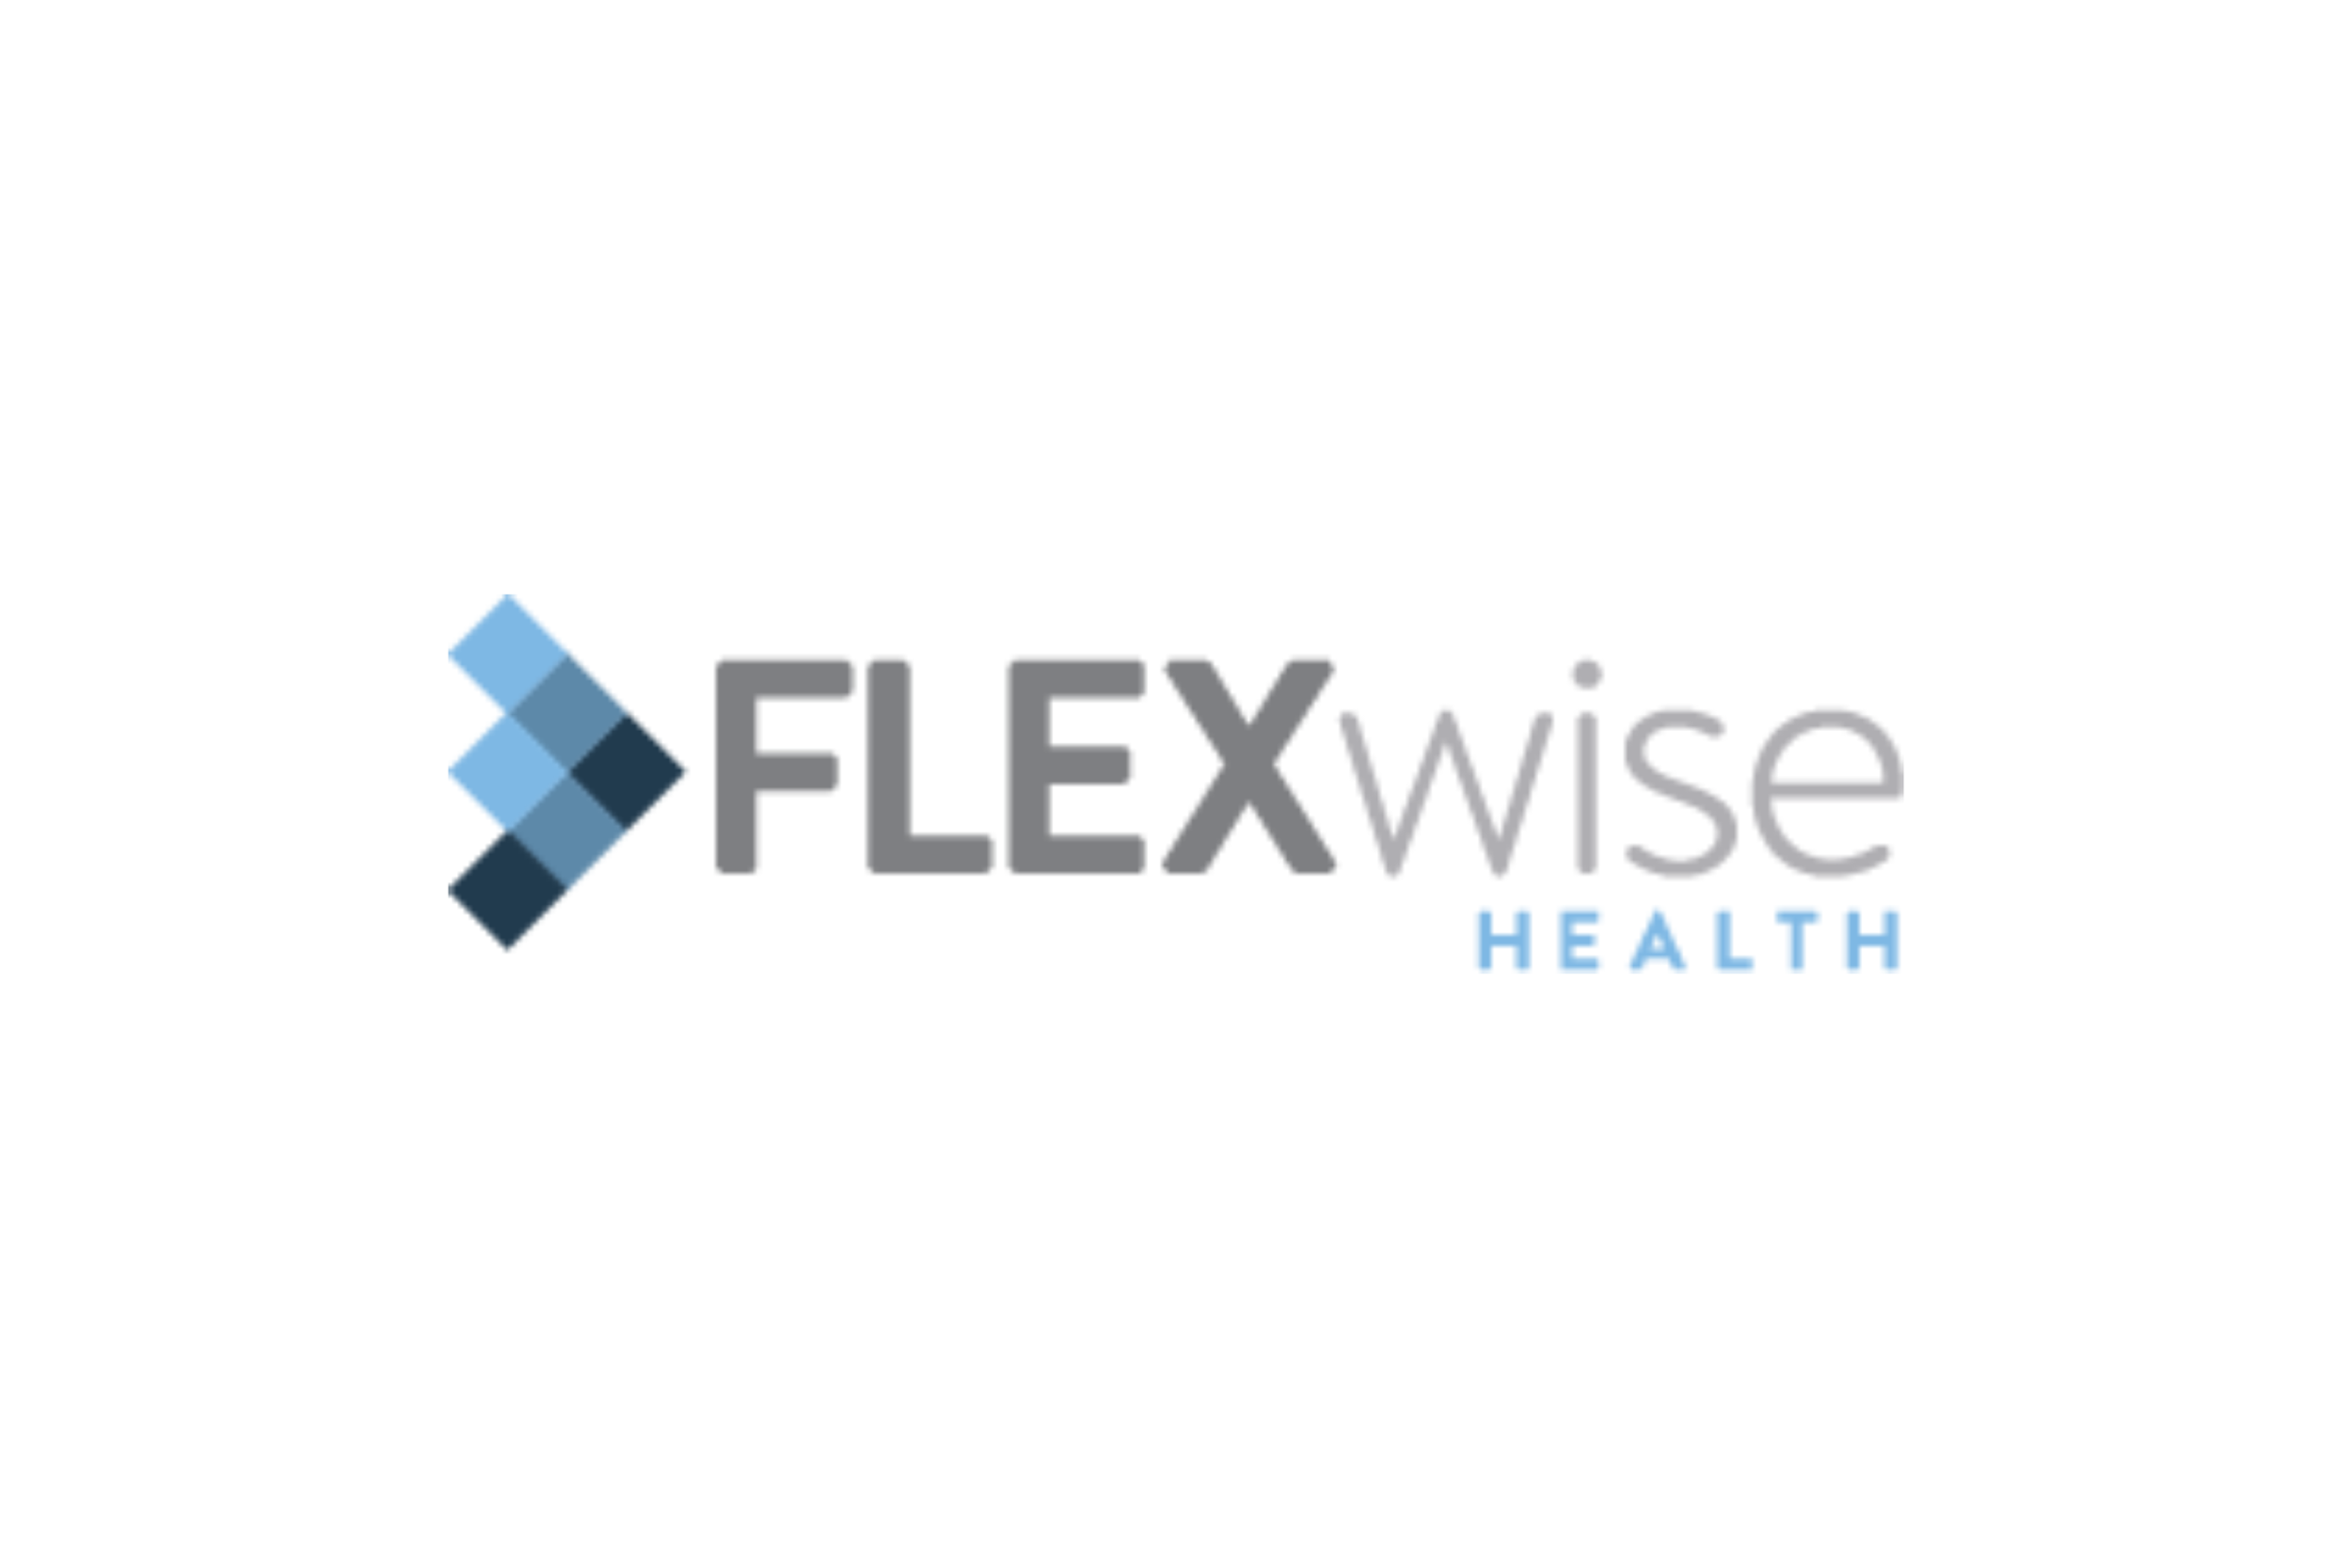 Flexwise Health